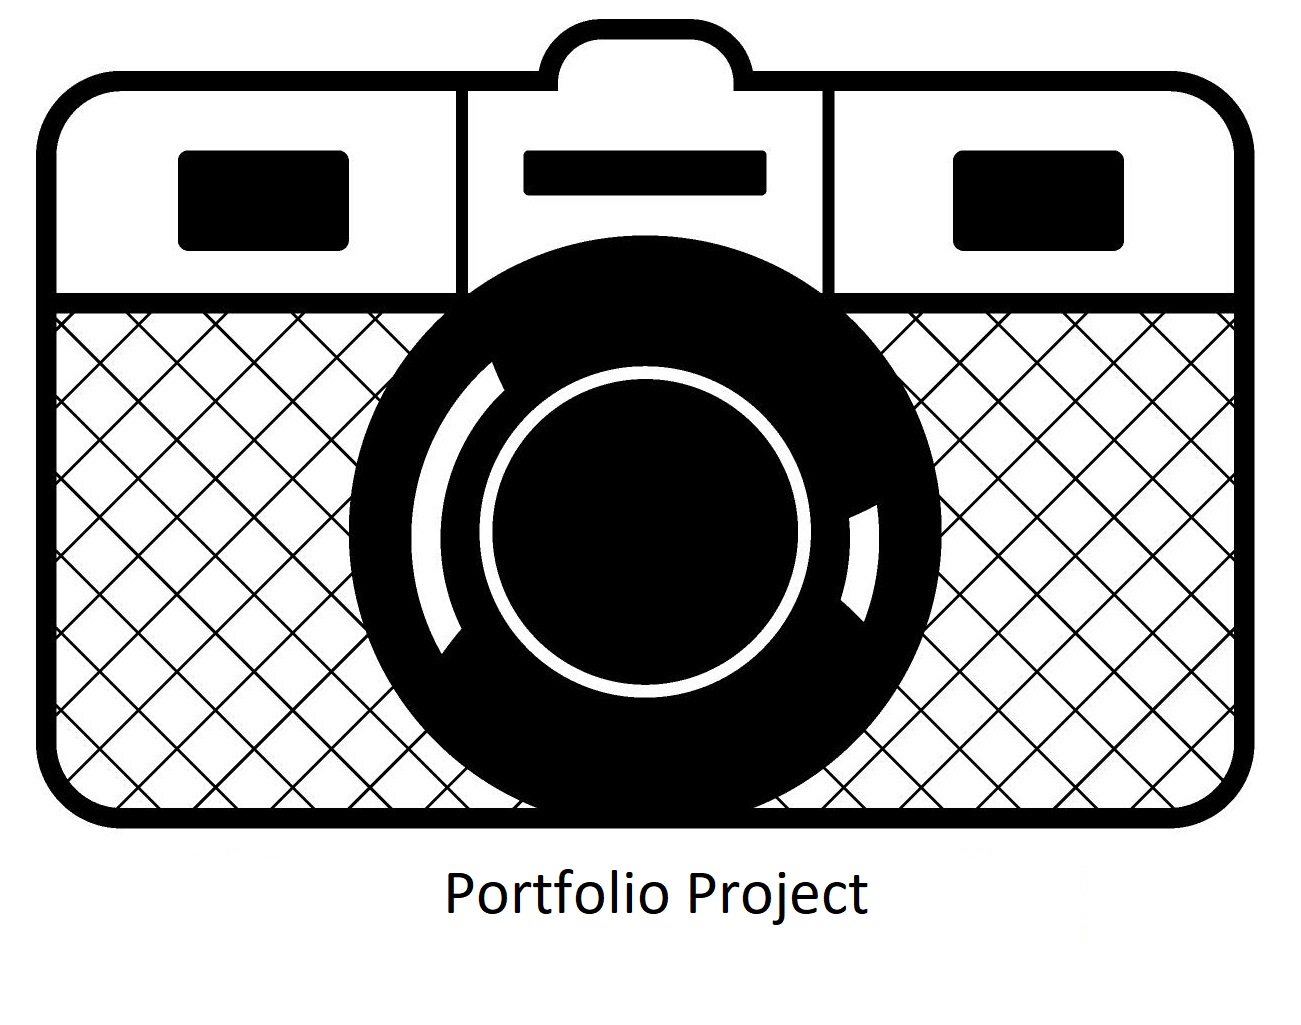 Camera_Portfolio_Project.jpg